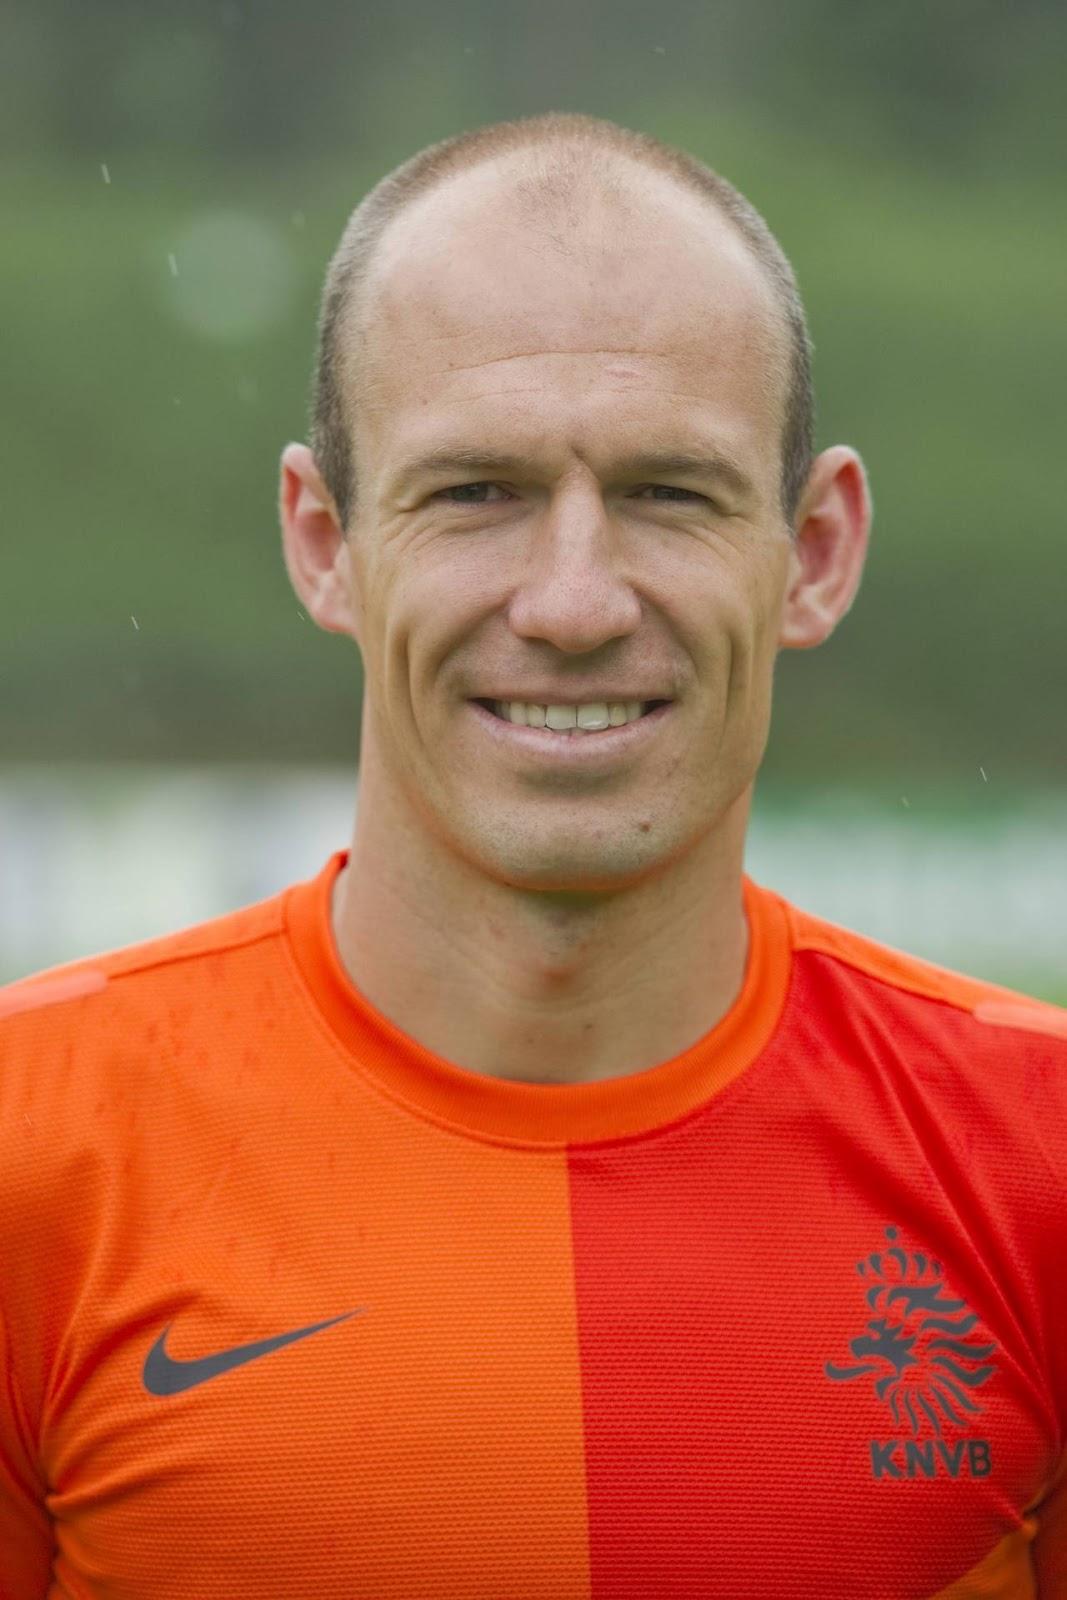 Arjen Robben - Images